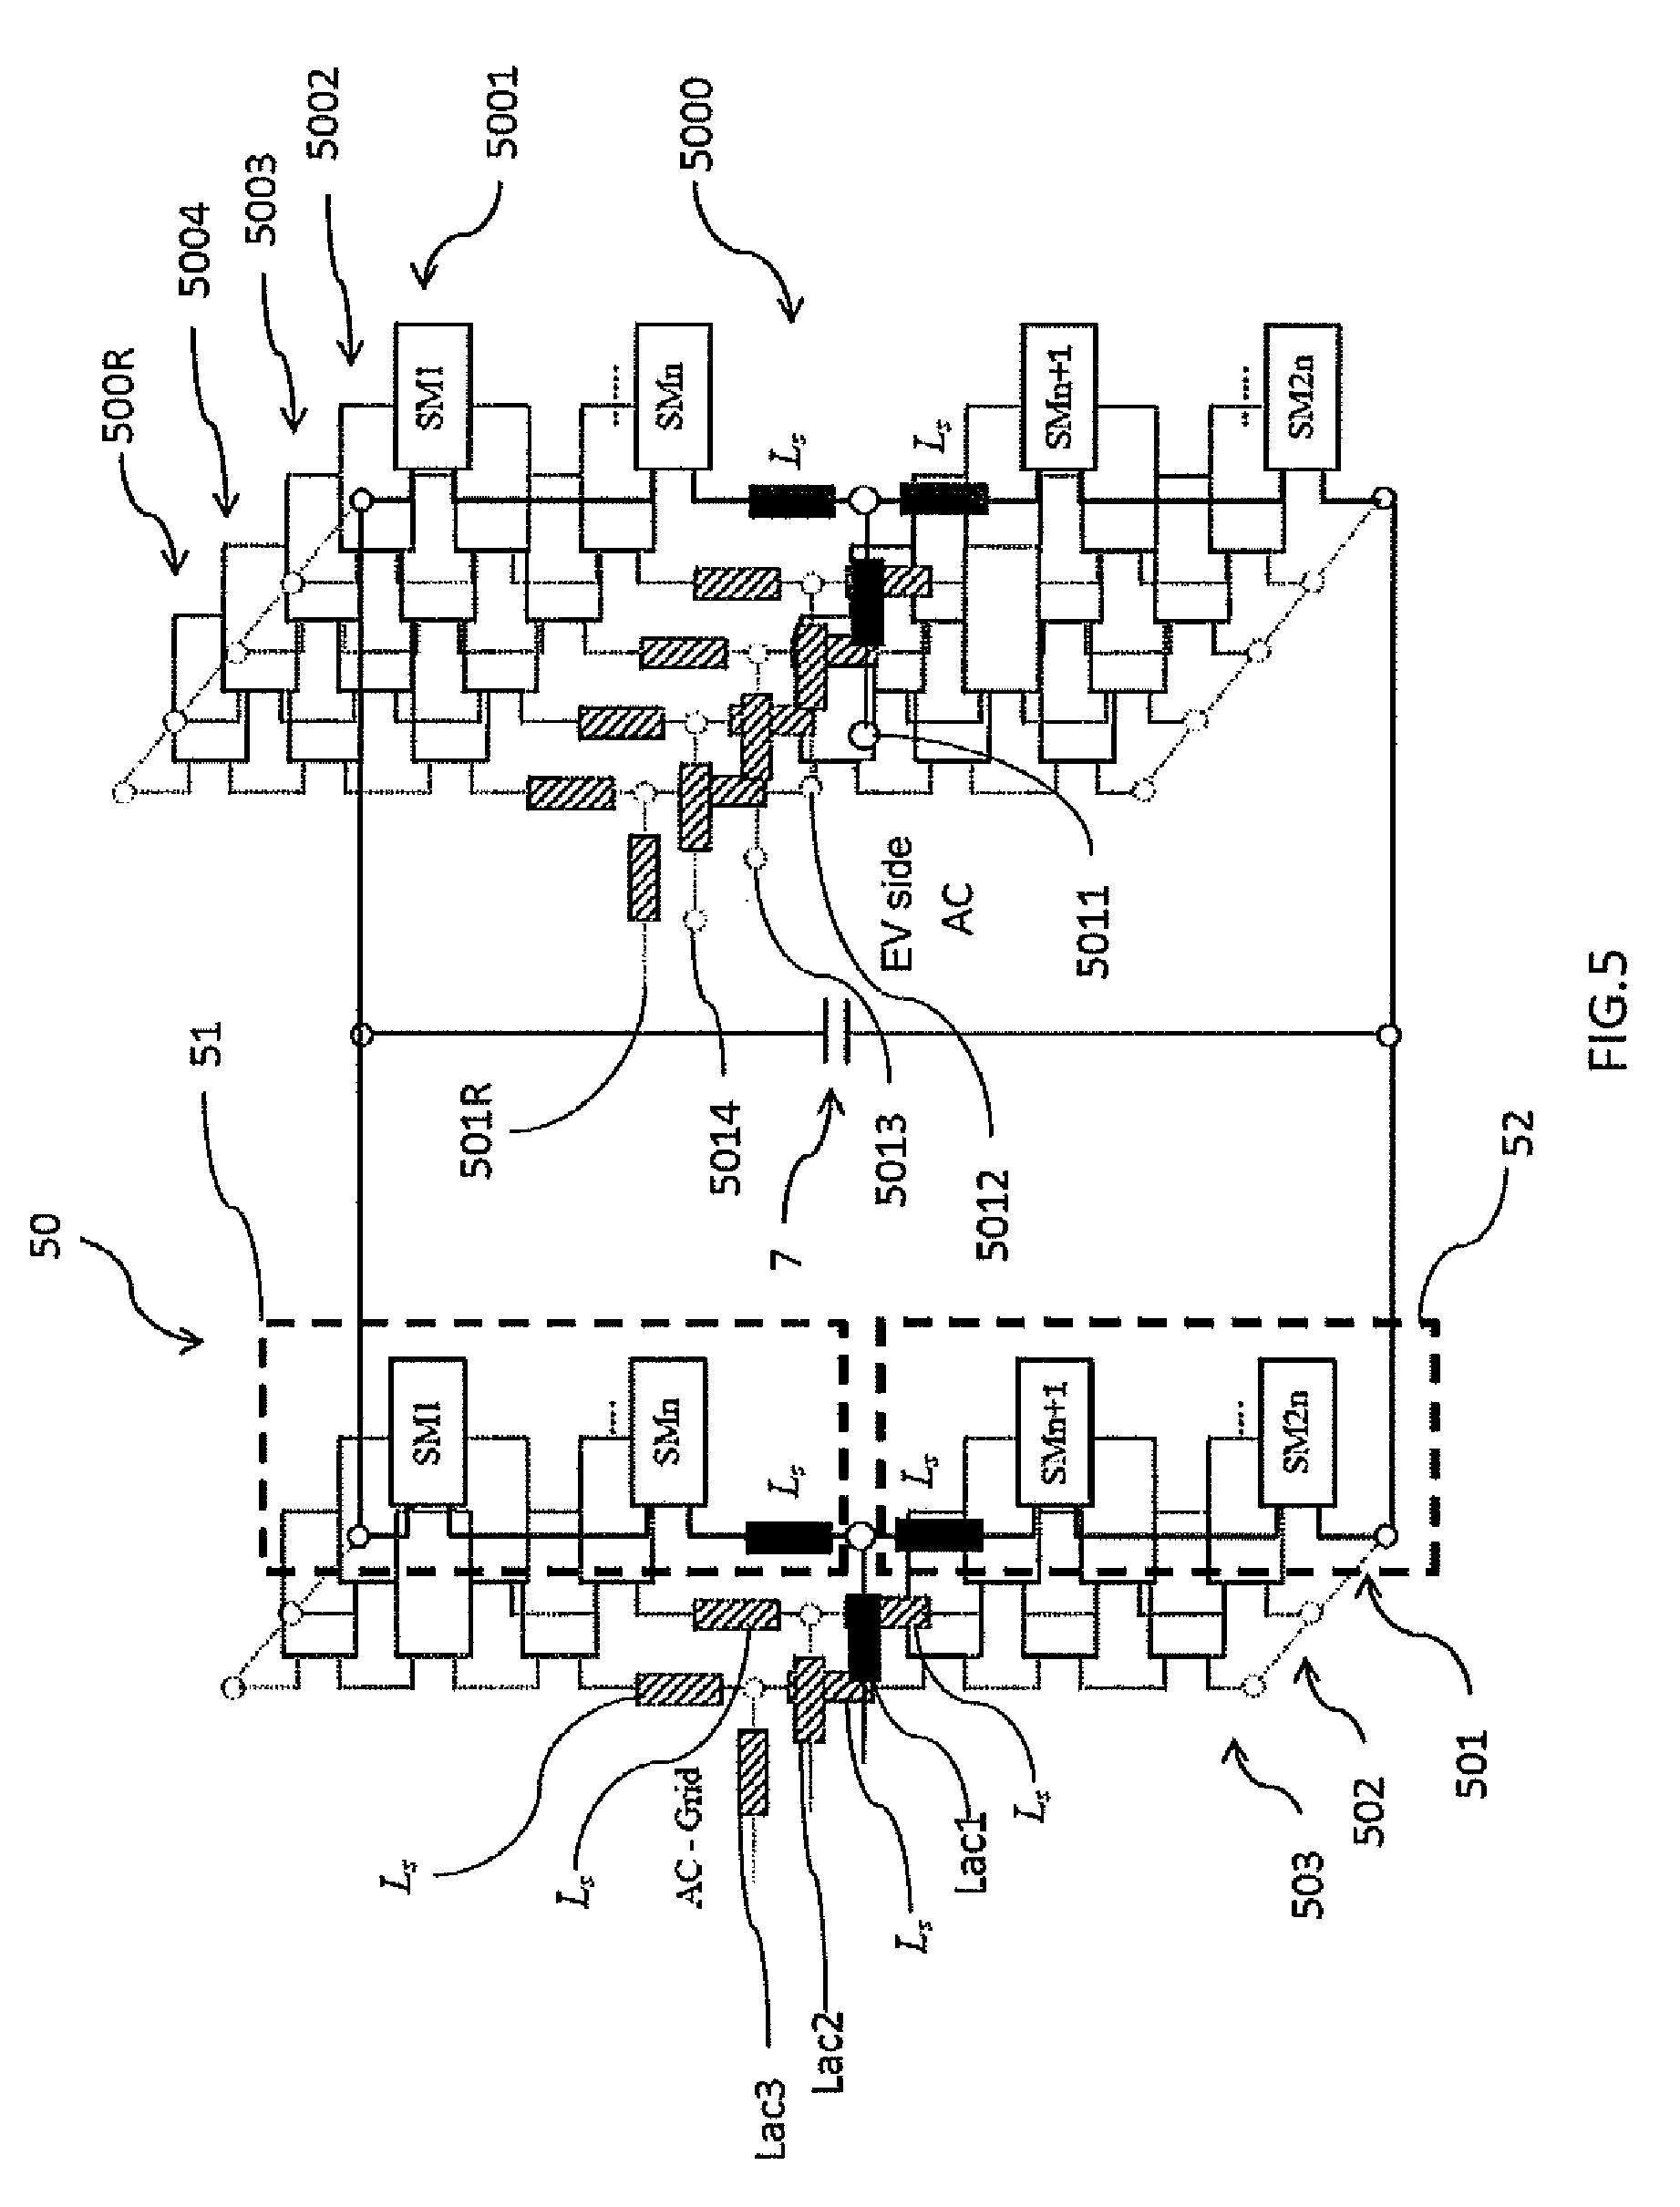 generac rv generator wiring diagram subaru impreza np 52g trouble the laptop junction